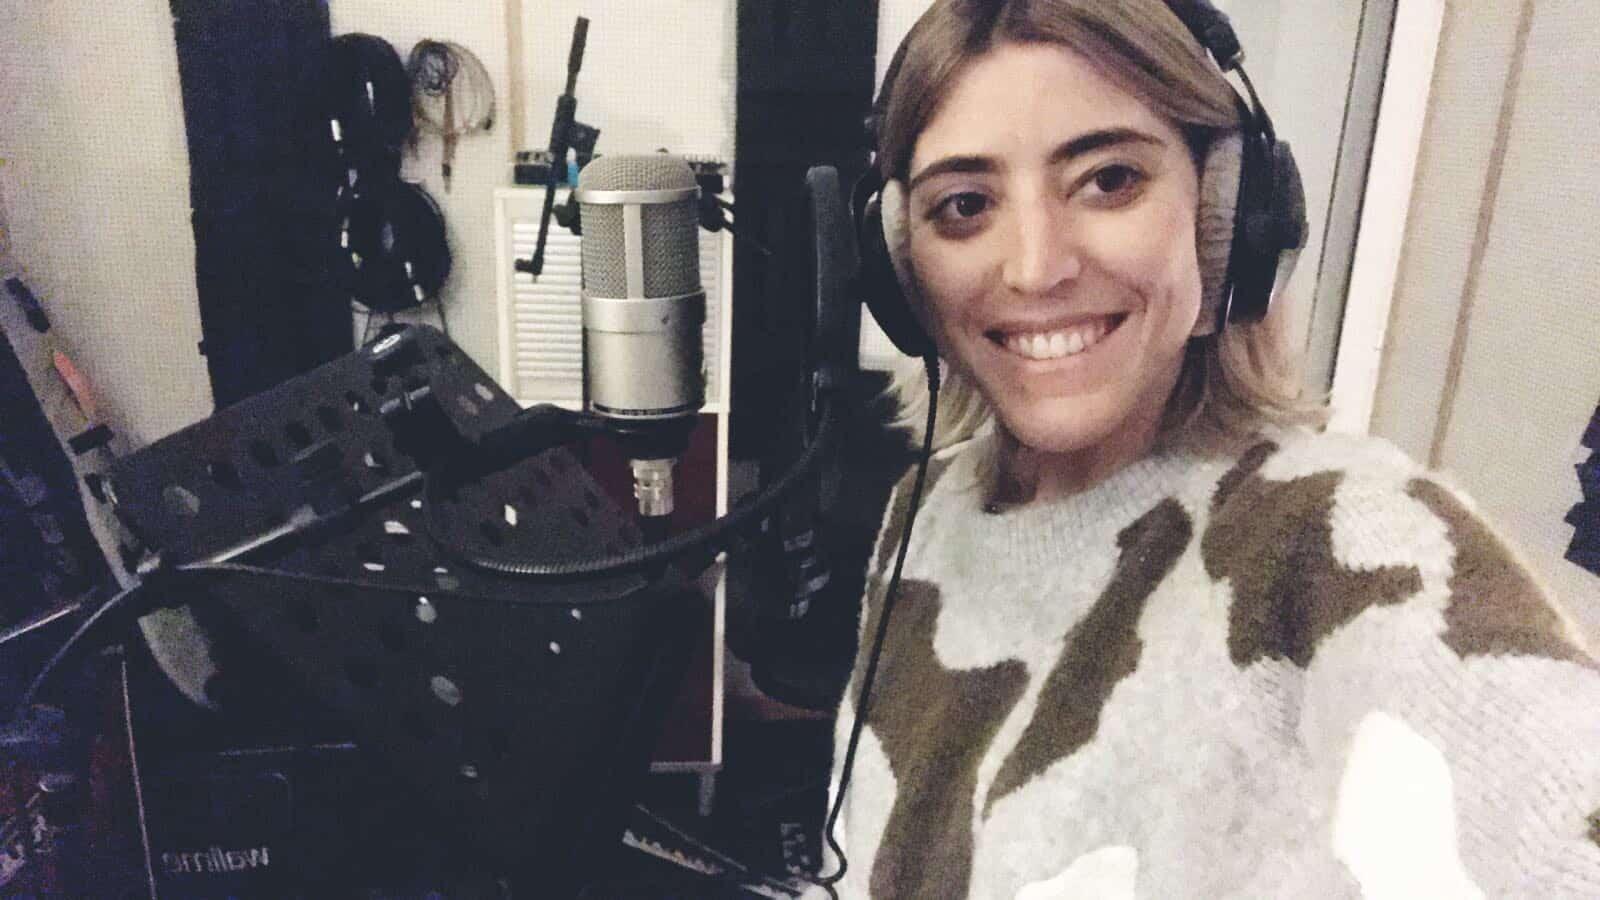 Bea in the studio